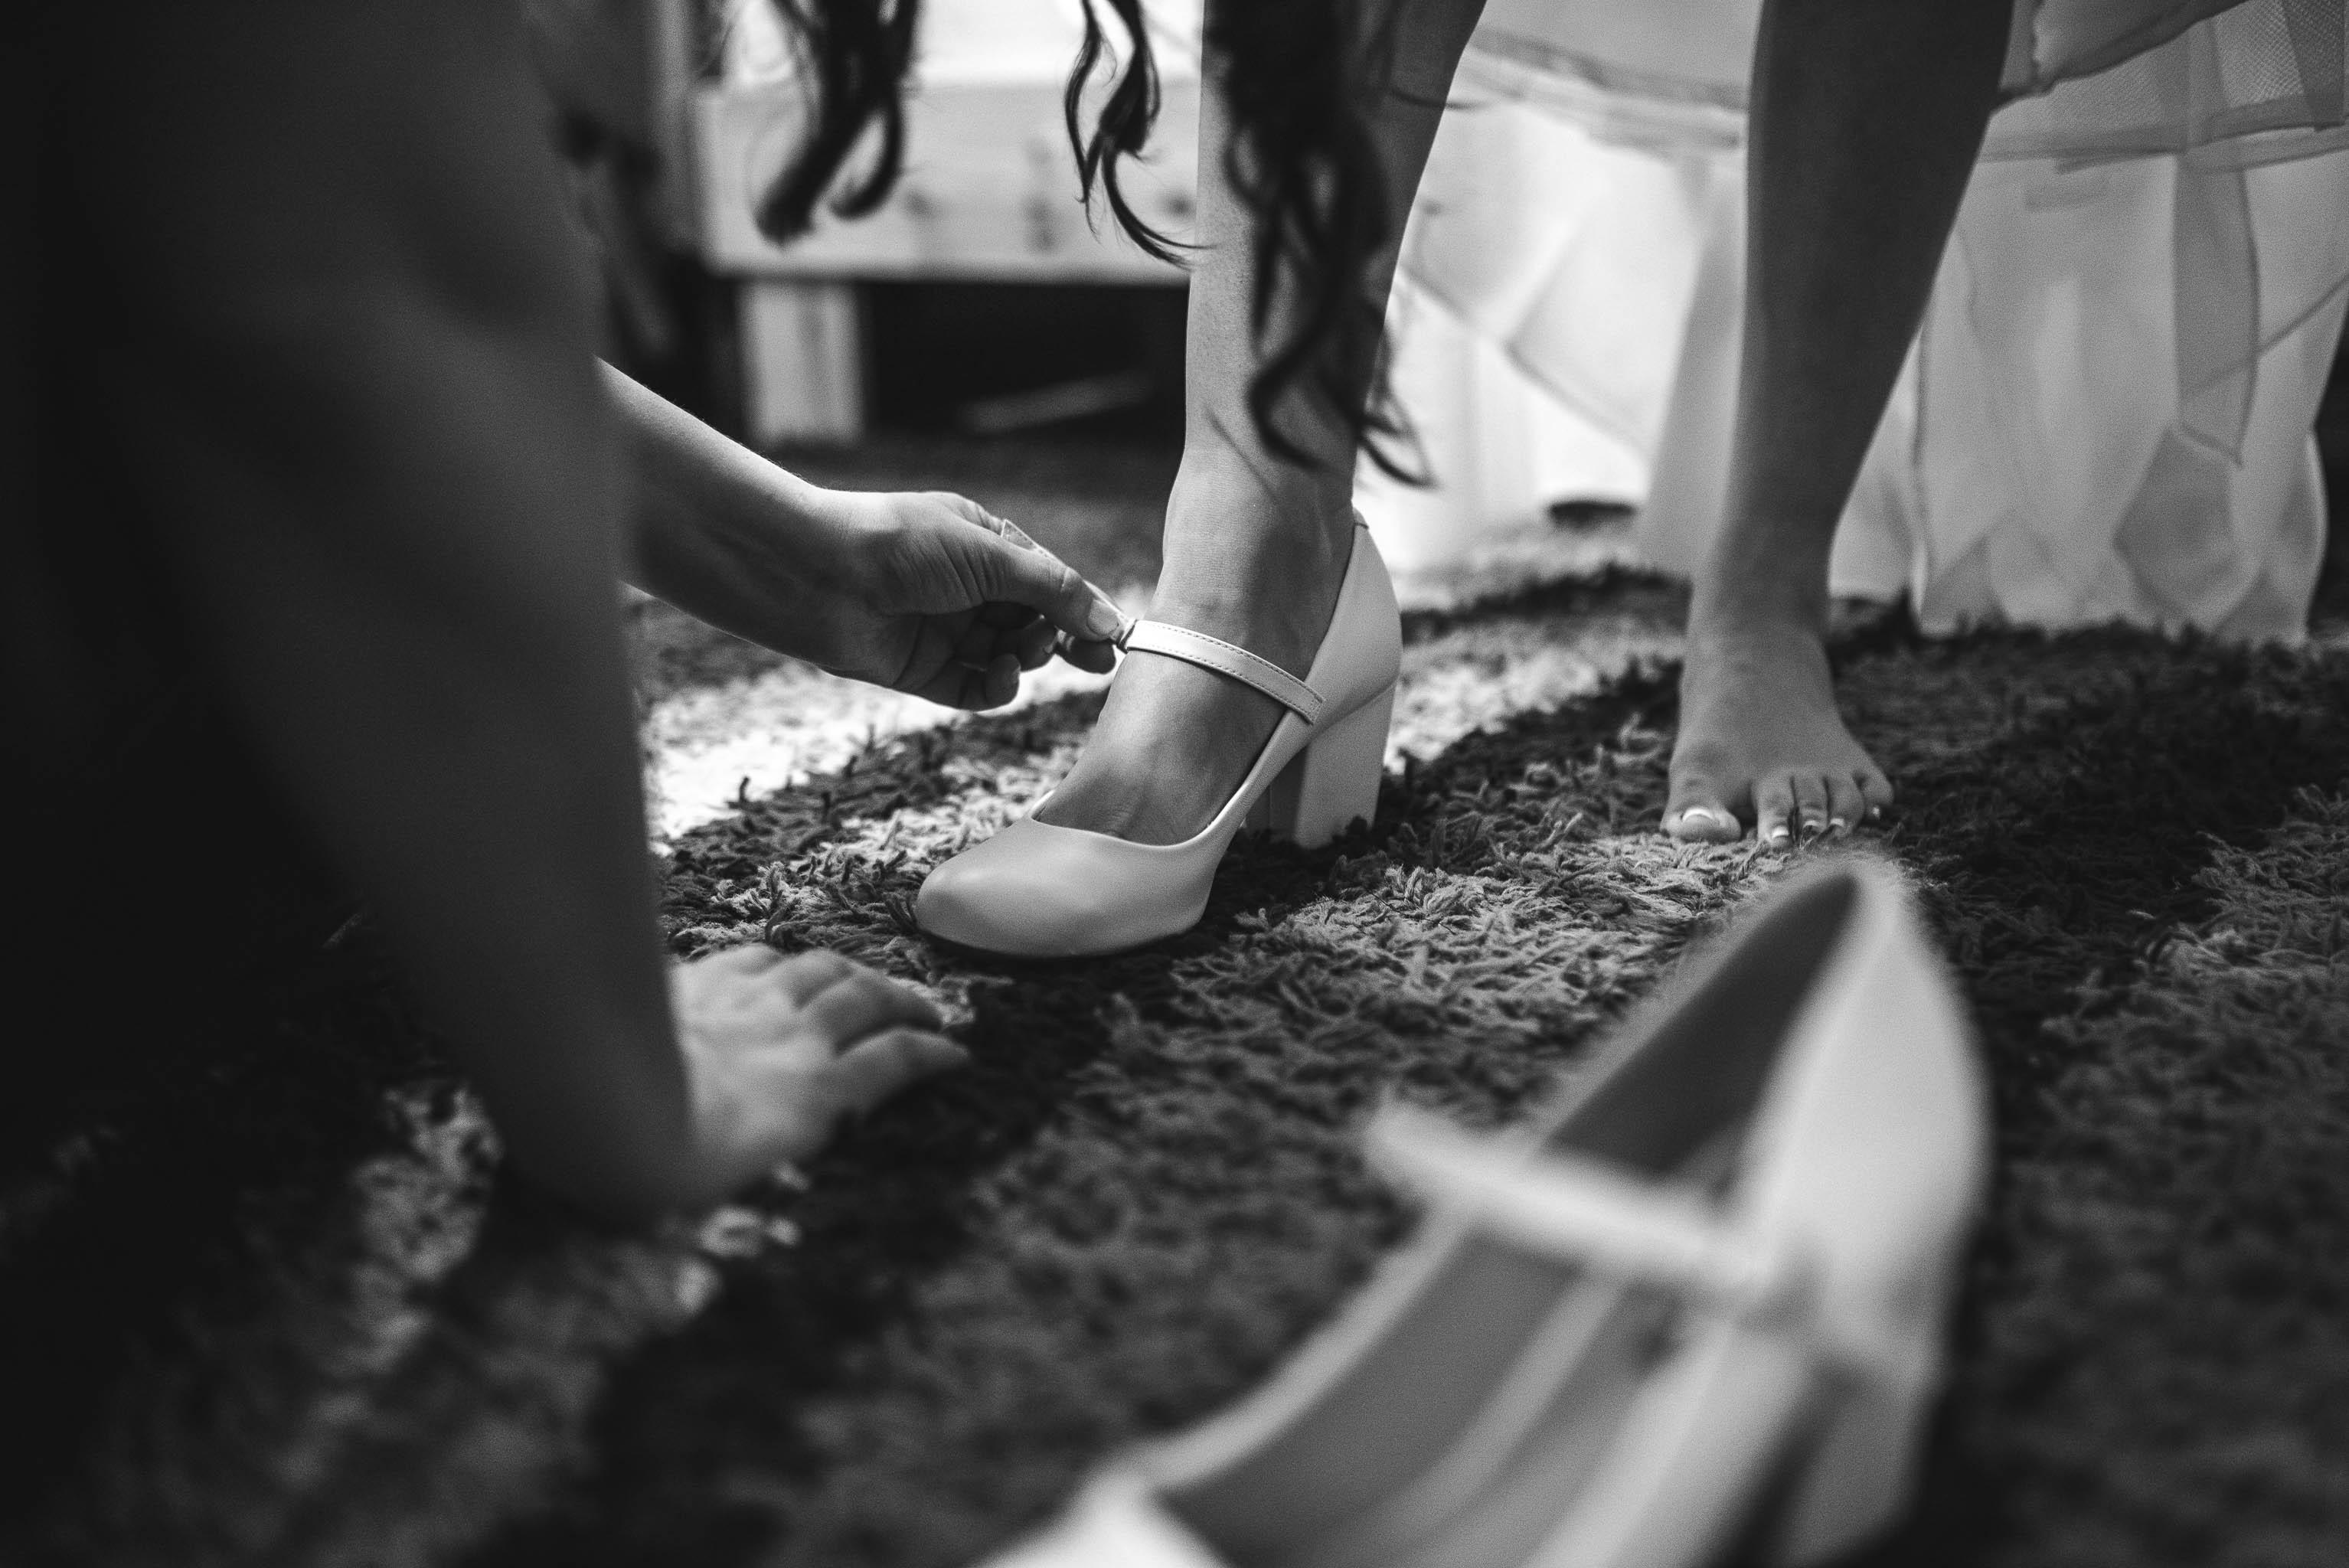 fotografo documental de matrimonios-fotografo matrimonio santiago-preparativos novia